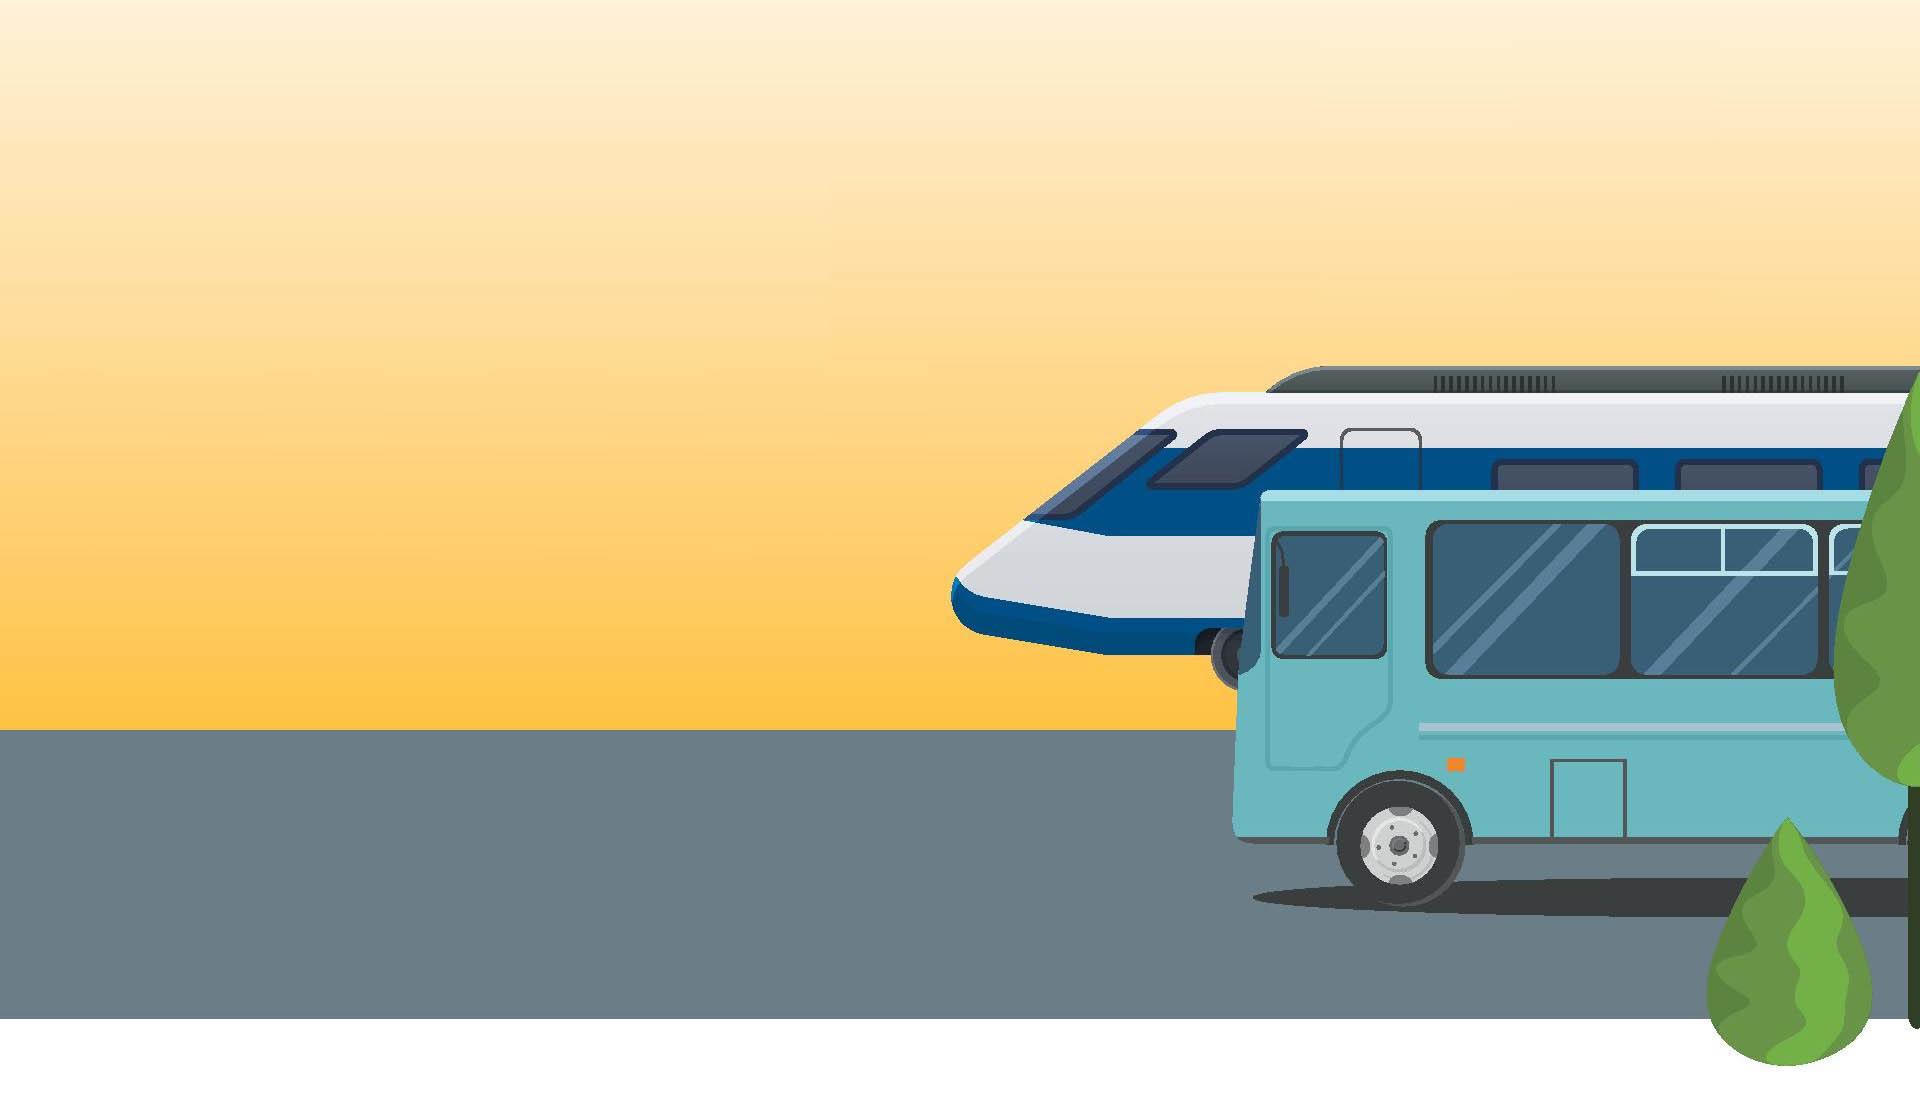 Obrazek: pociąg i autobus